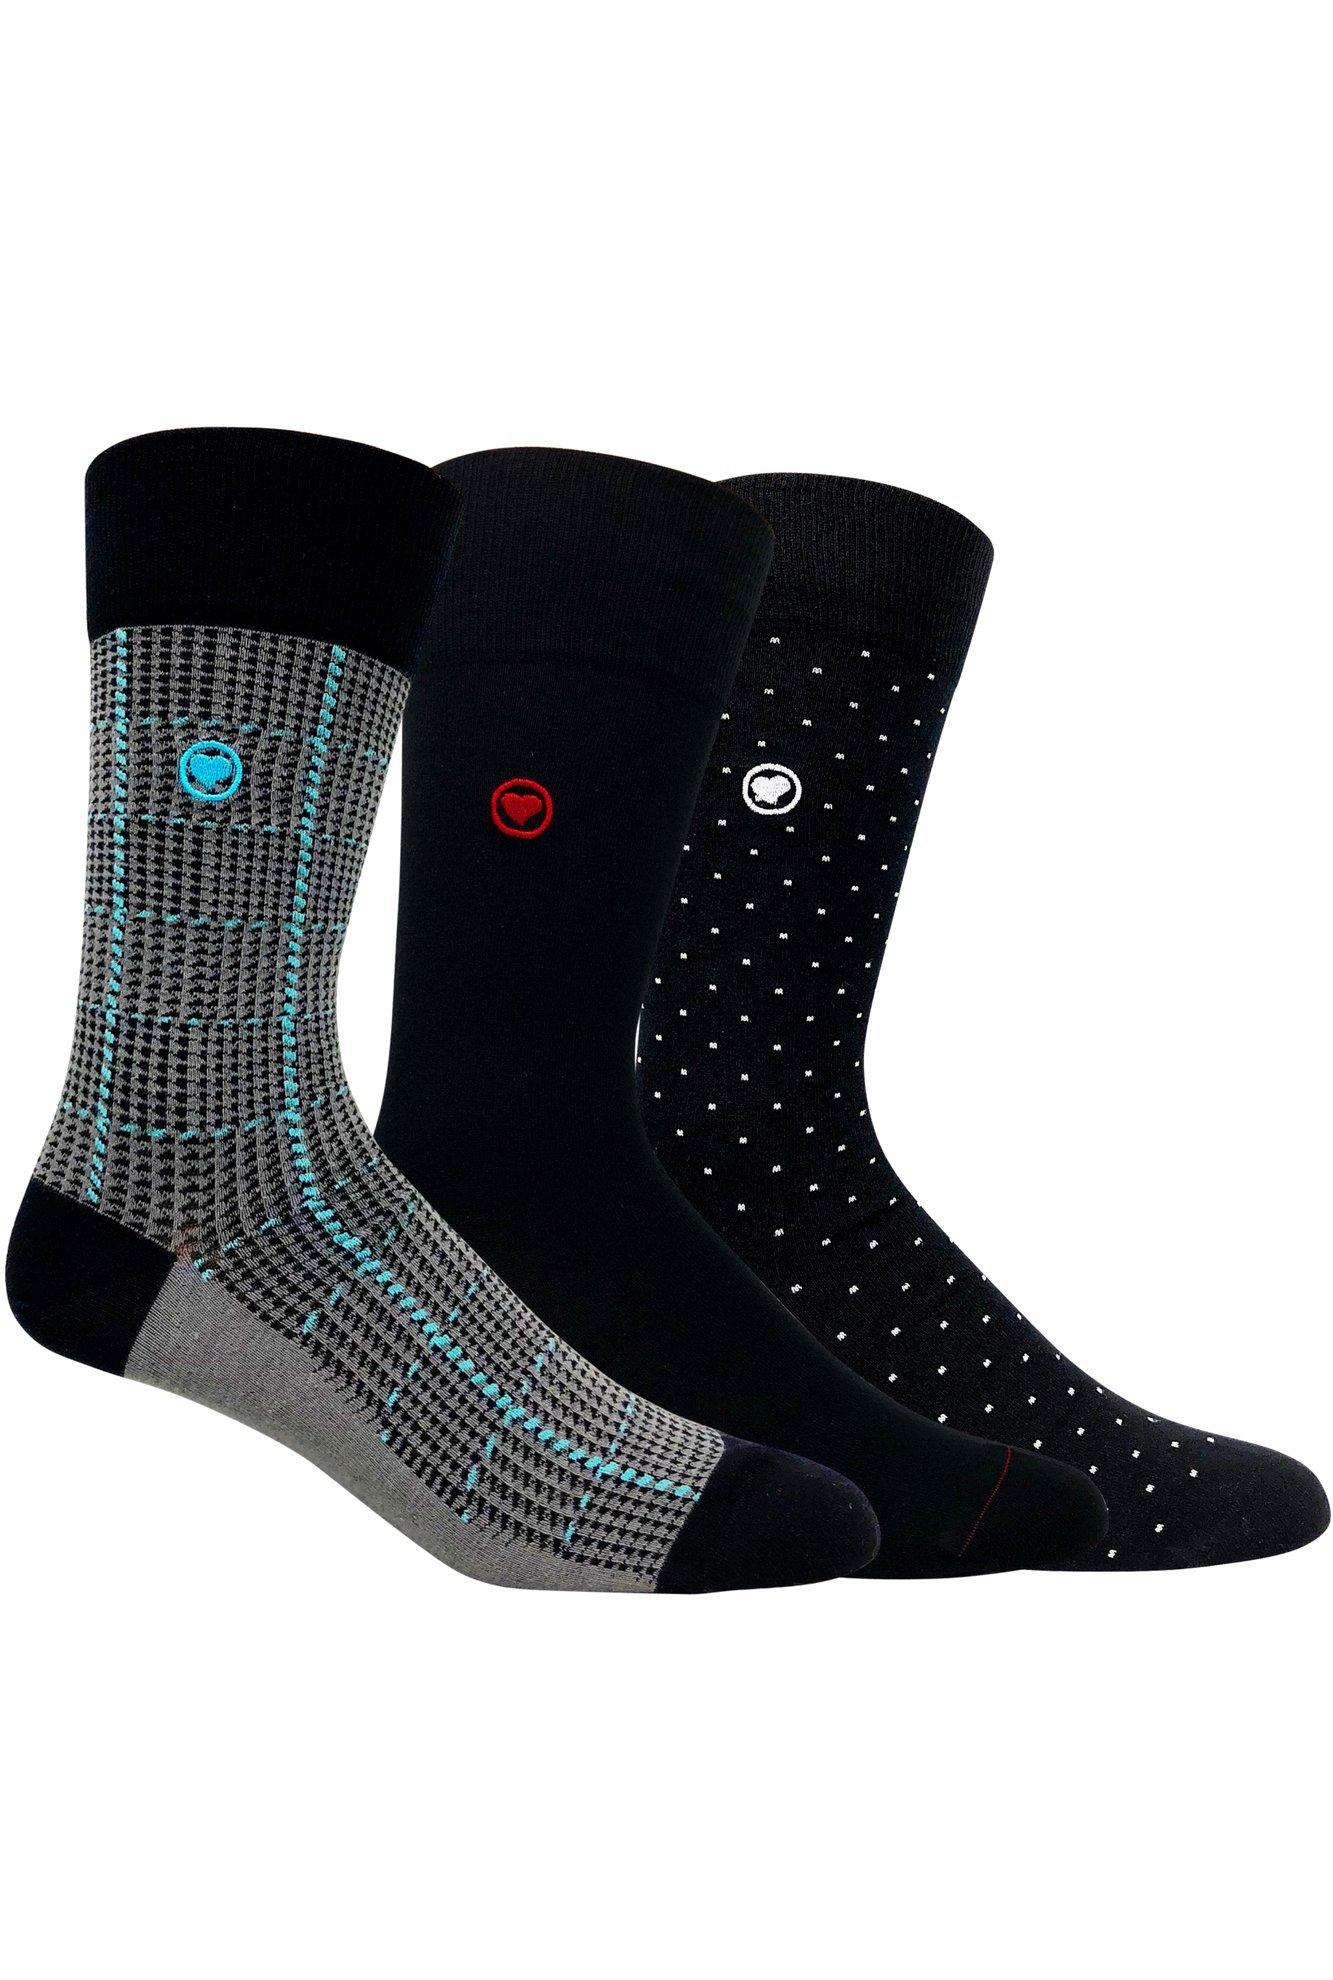 LOVE SOCK COMPANY Black Organic cotton men's dress socks bundle. 3 Premium black socks solid, polka dots and houndstooth patterned socks set by LOVE SOCK COMPANY (Image #1)